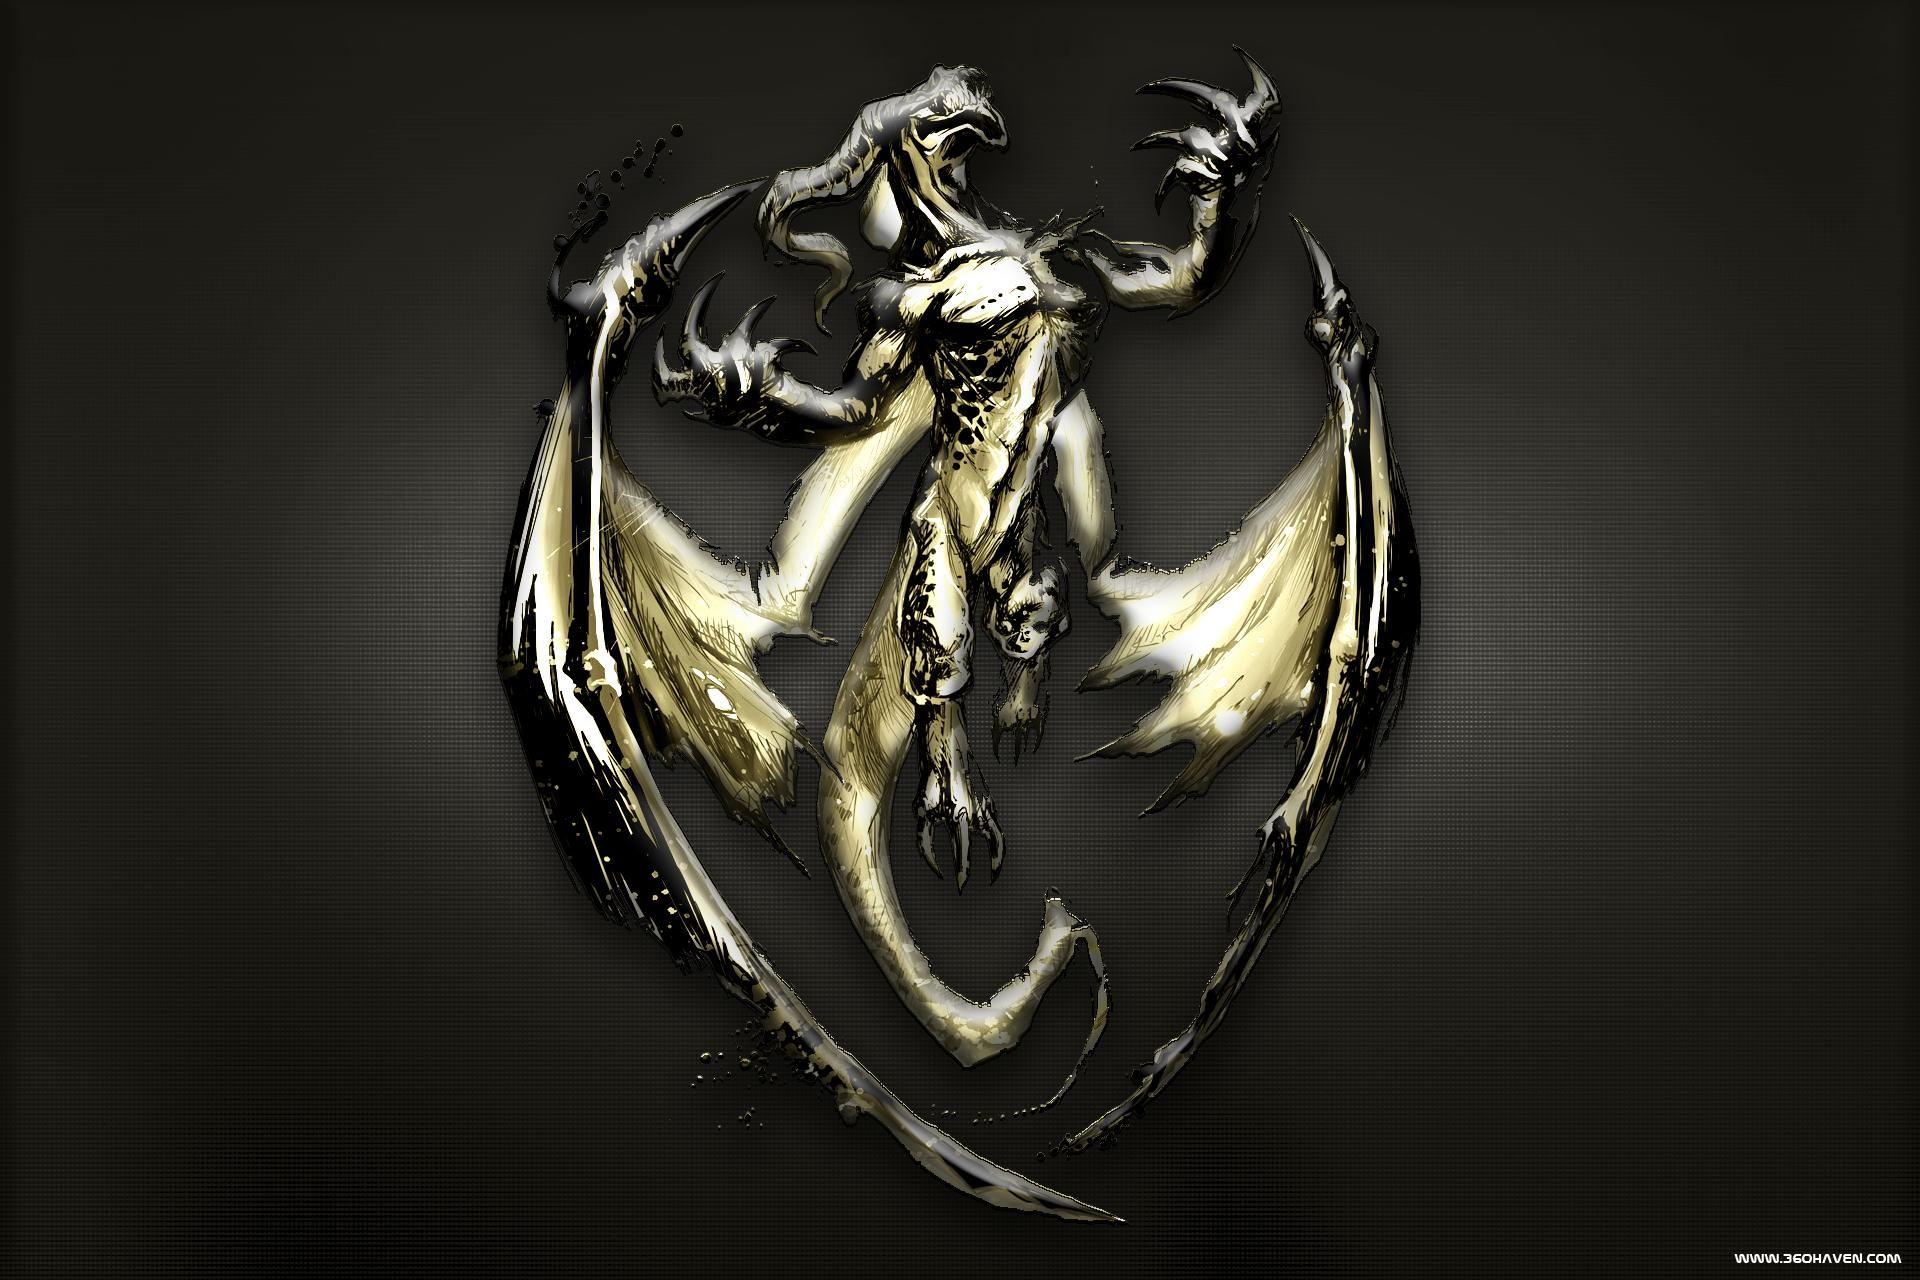 [Wallpaper] Golden Dragon Wallpapers 2